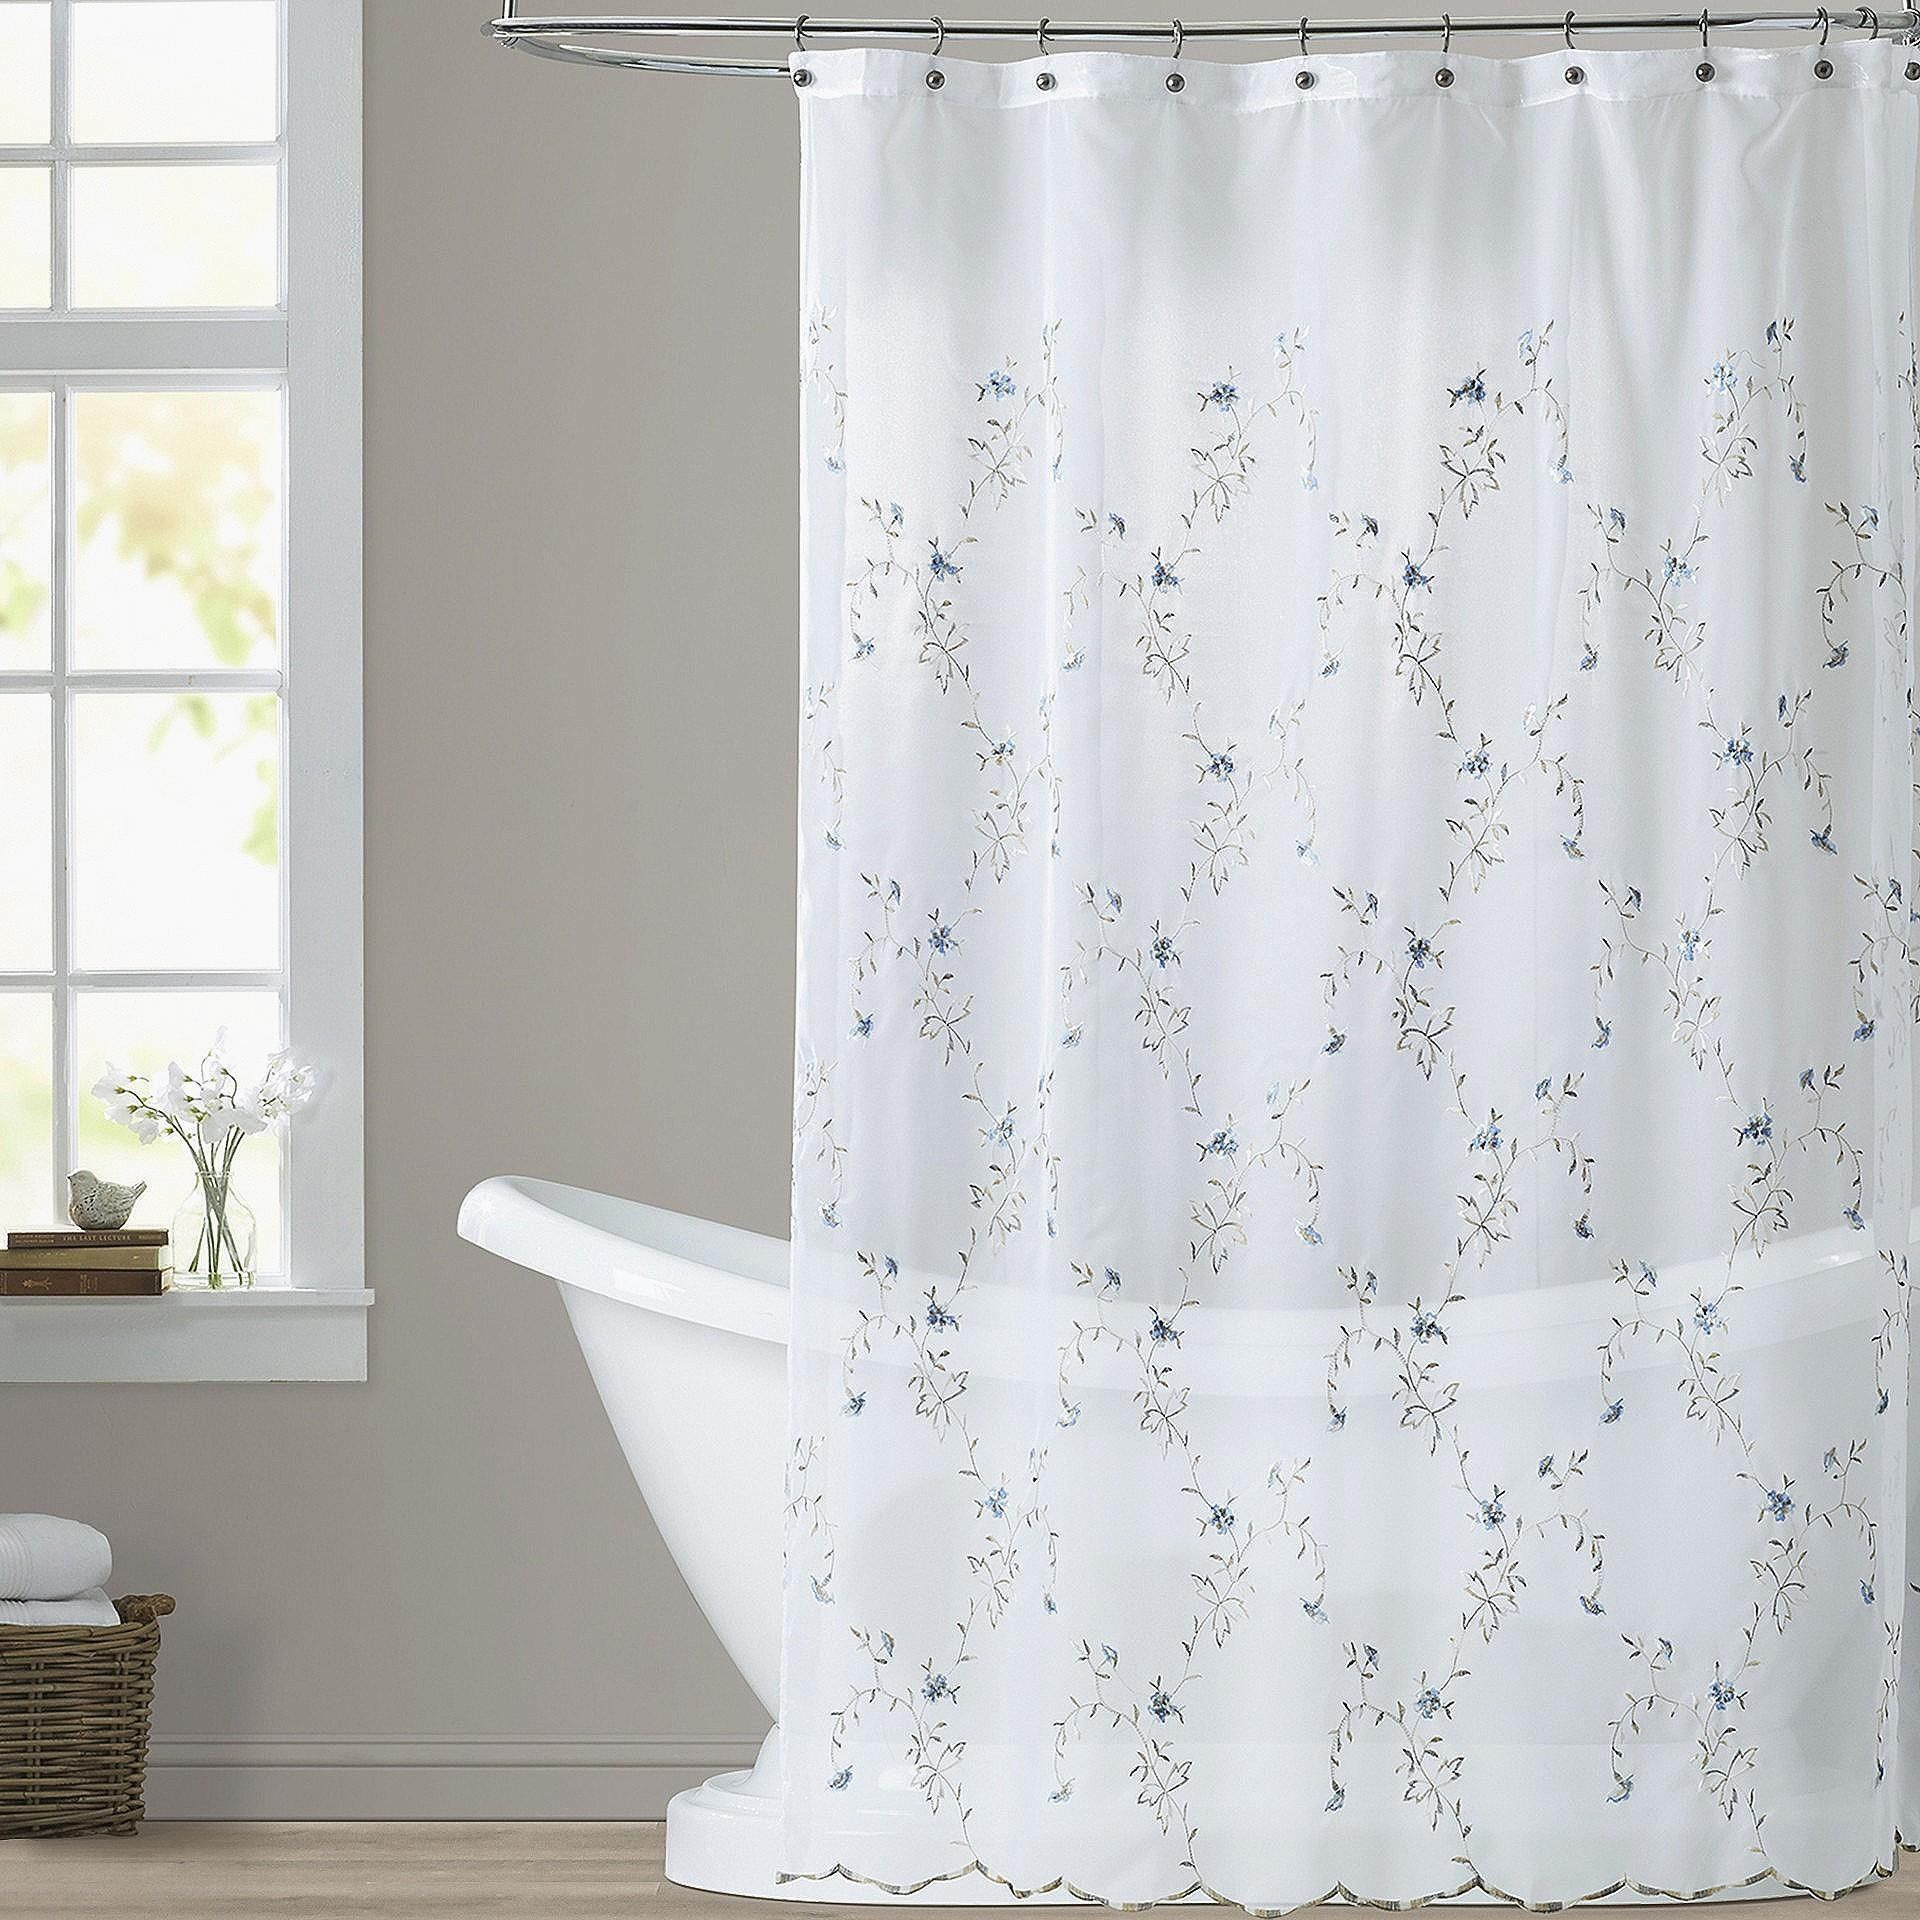 Unique Elk Shower Curtain Check More At Homefurnitureone